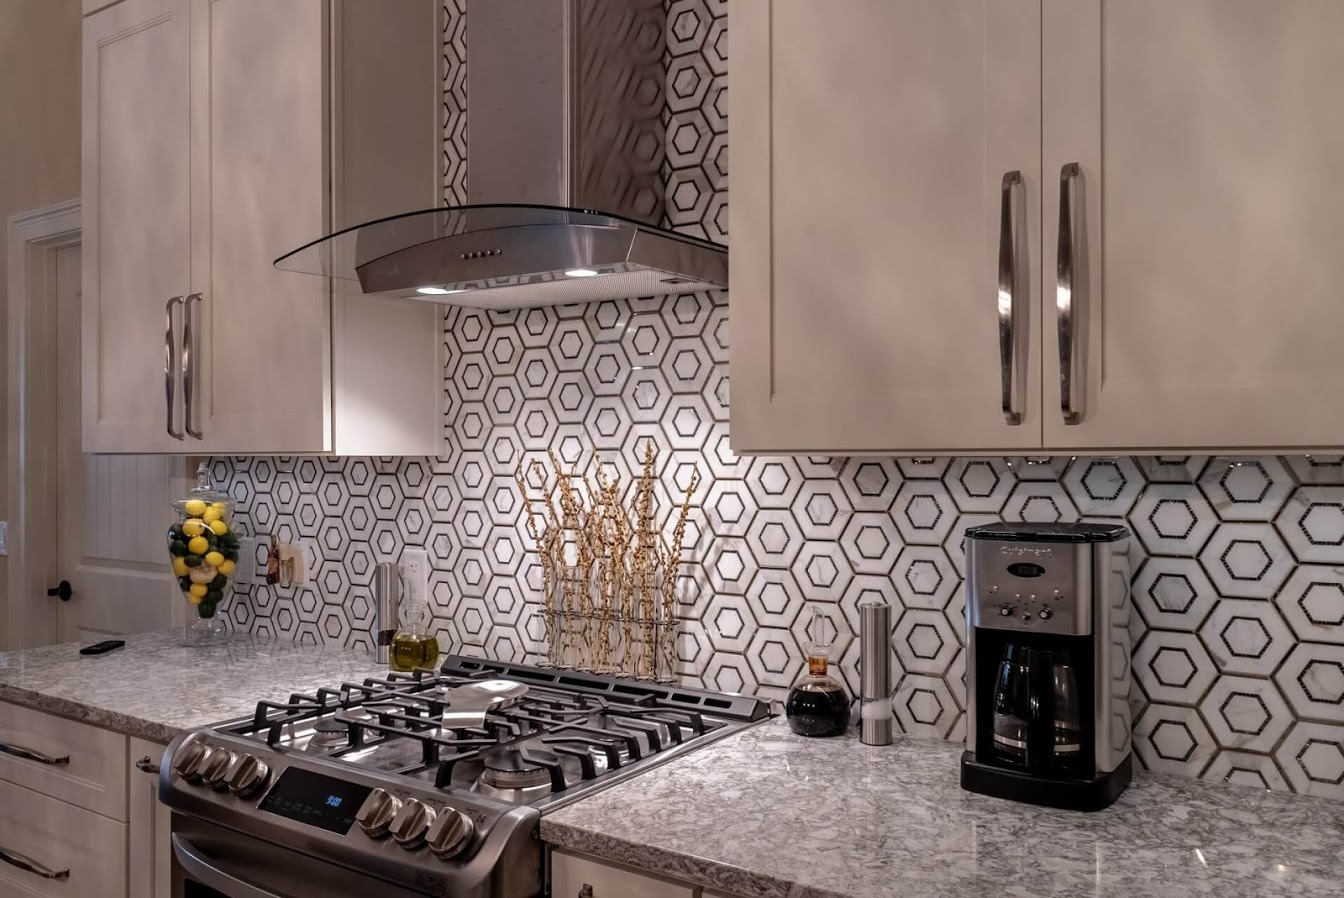 Hexagonal-tile-backsplash-and-Cambria-quartz-countertops-in-Berwyn-1916x1280.jpg